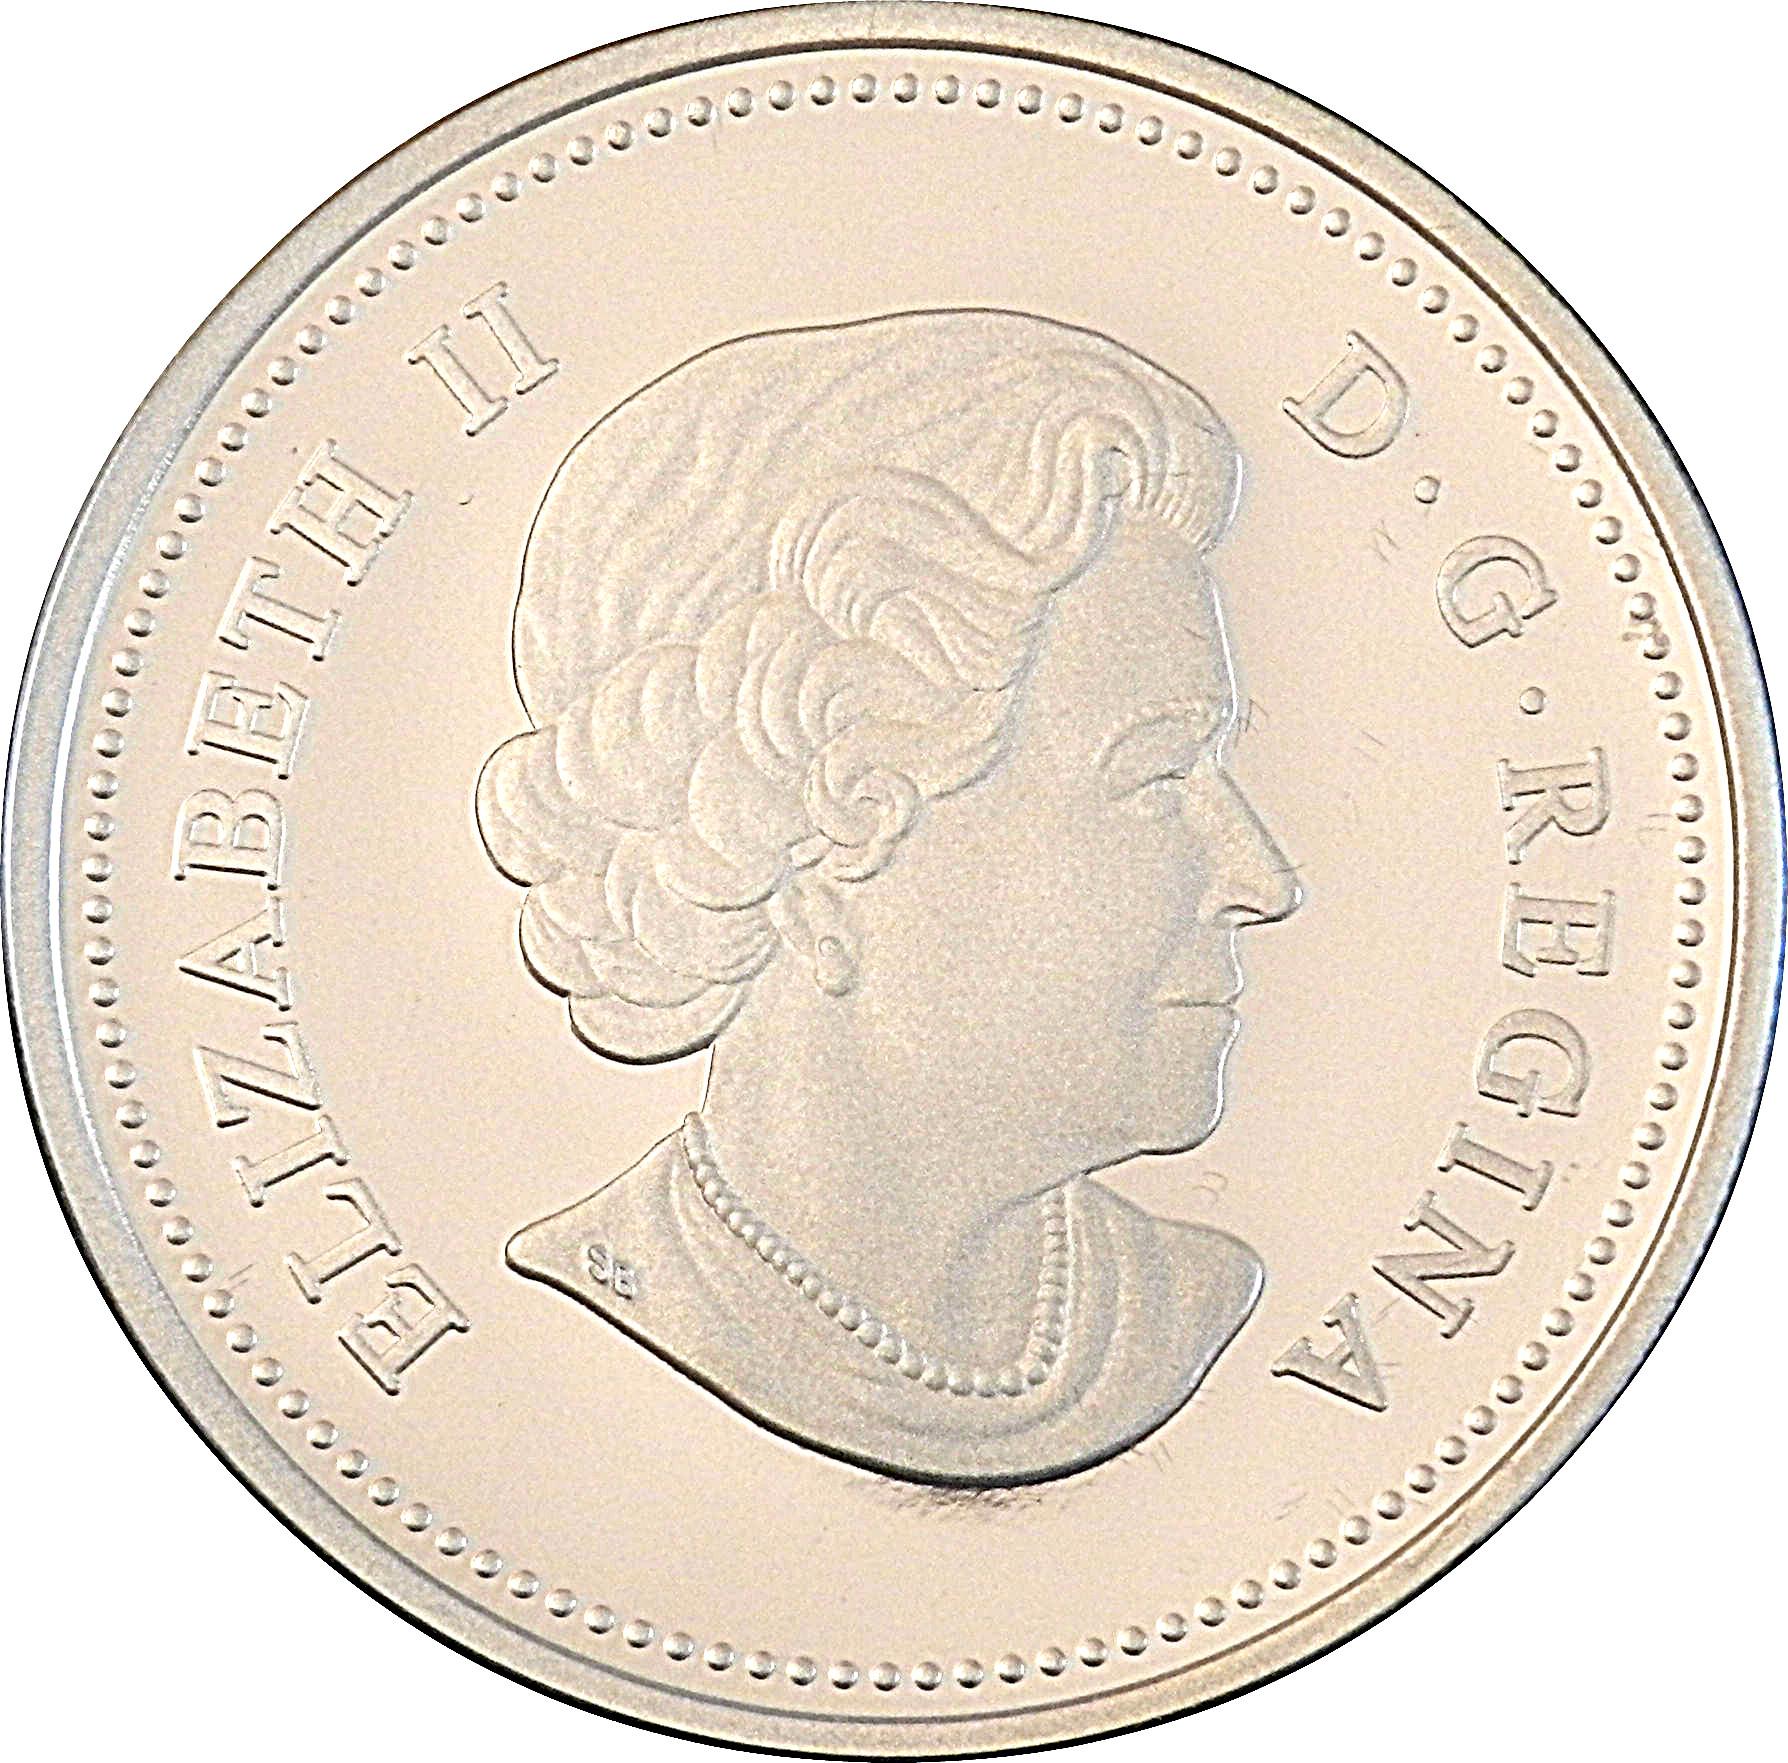 Canadian Dinosaurs 2014 Scutellosaurus $20 Fine Silver Coin